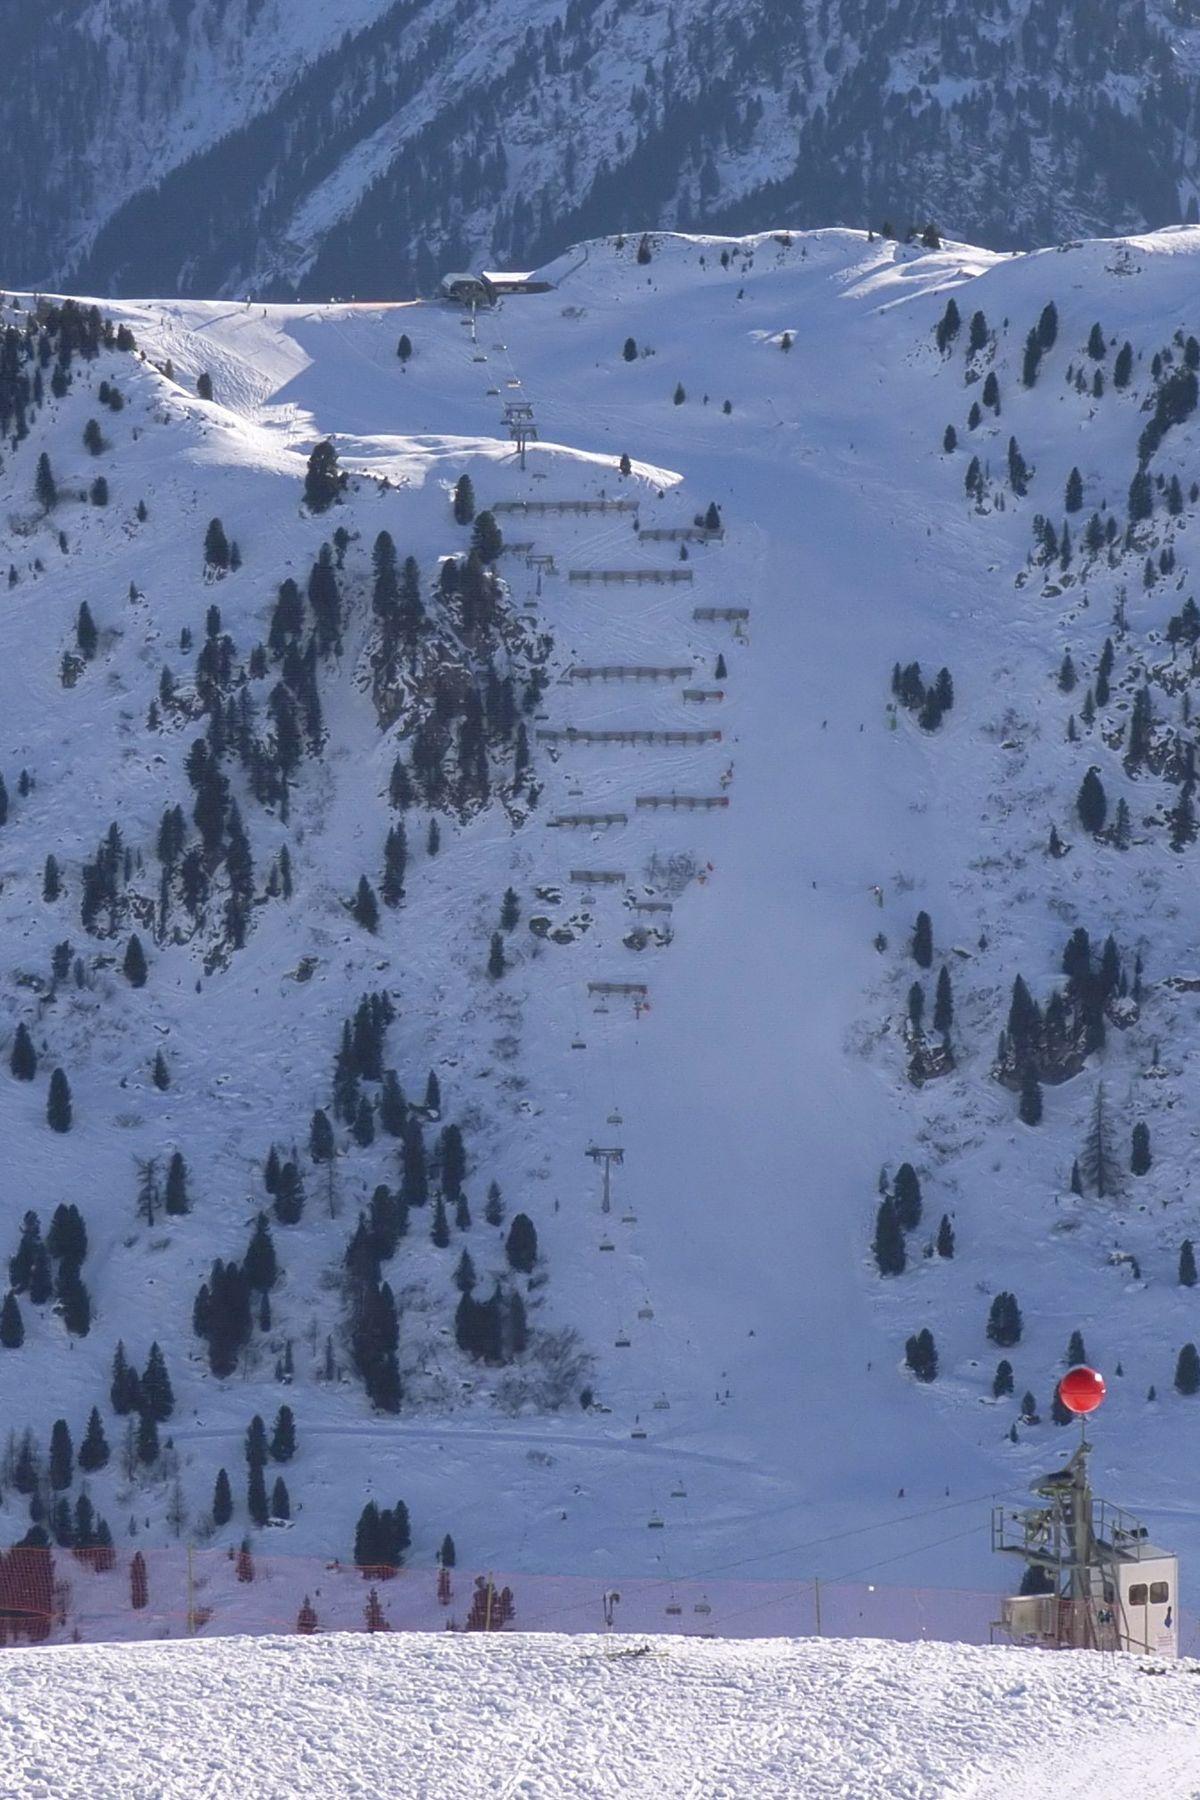 Harakiri piste de ski wikip dia for Piste de ski interieur